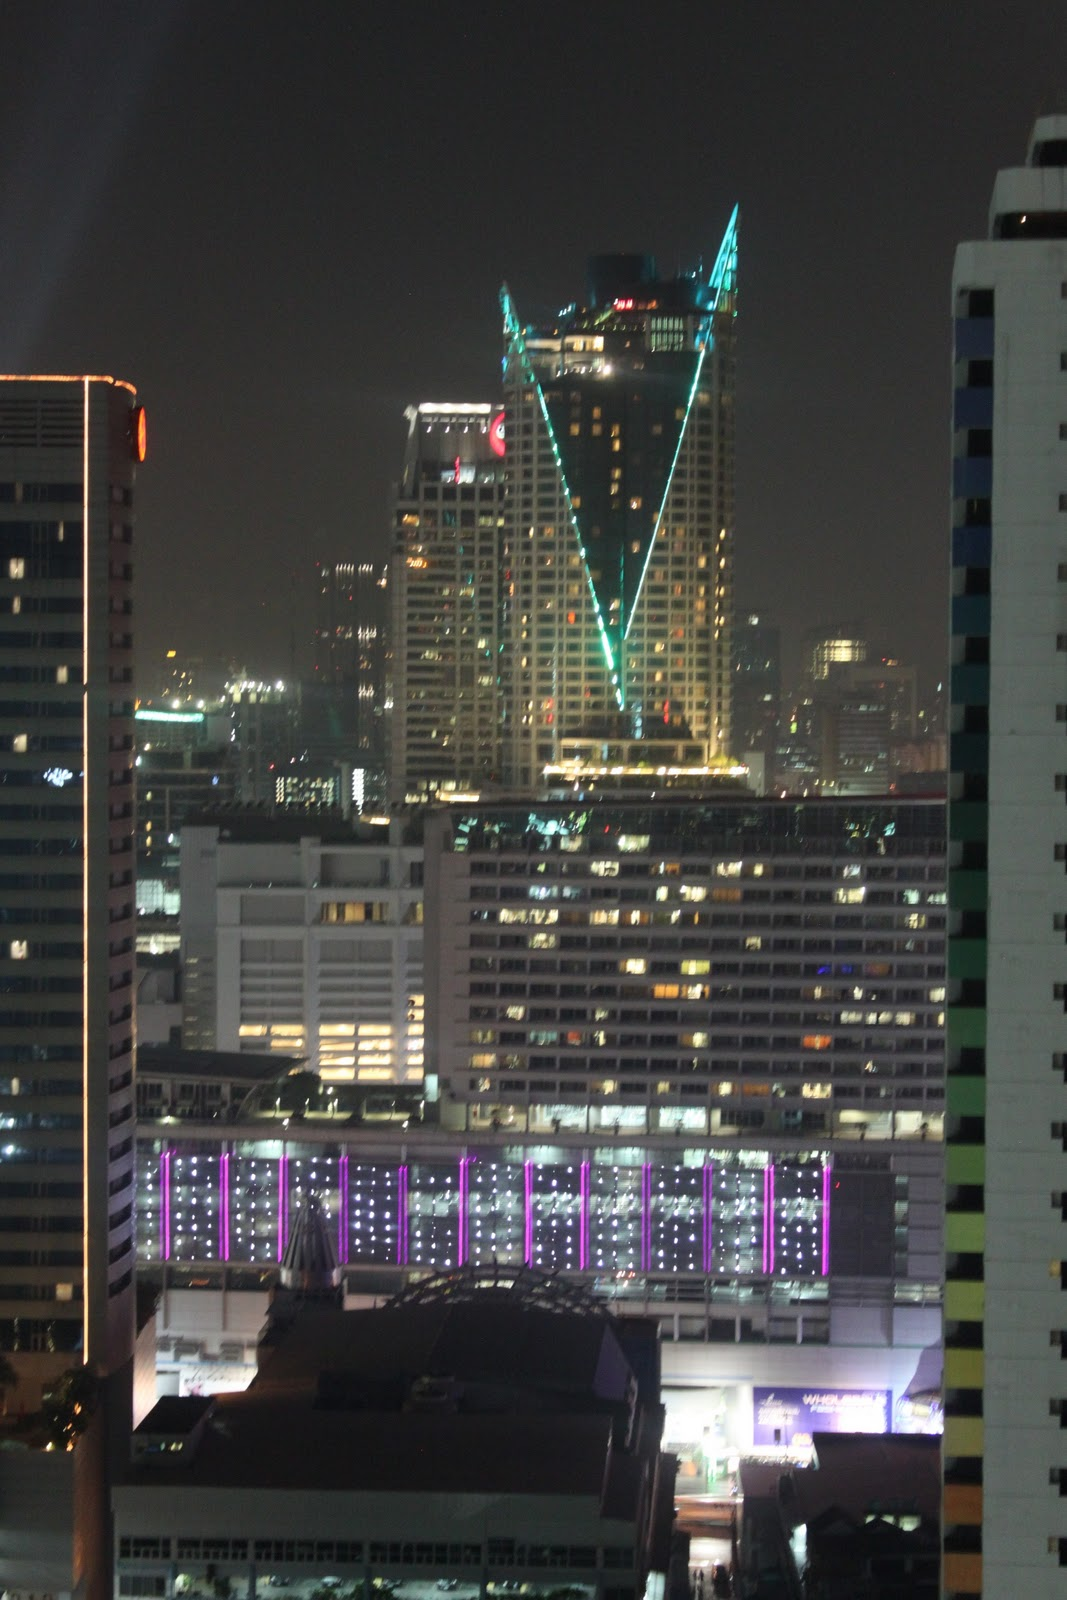 One night in Bangkok!